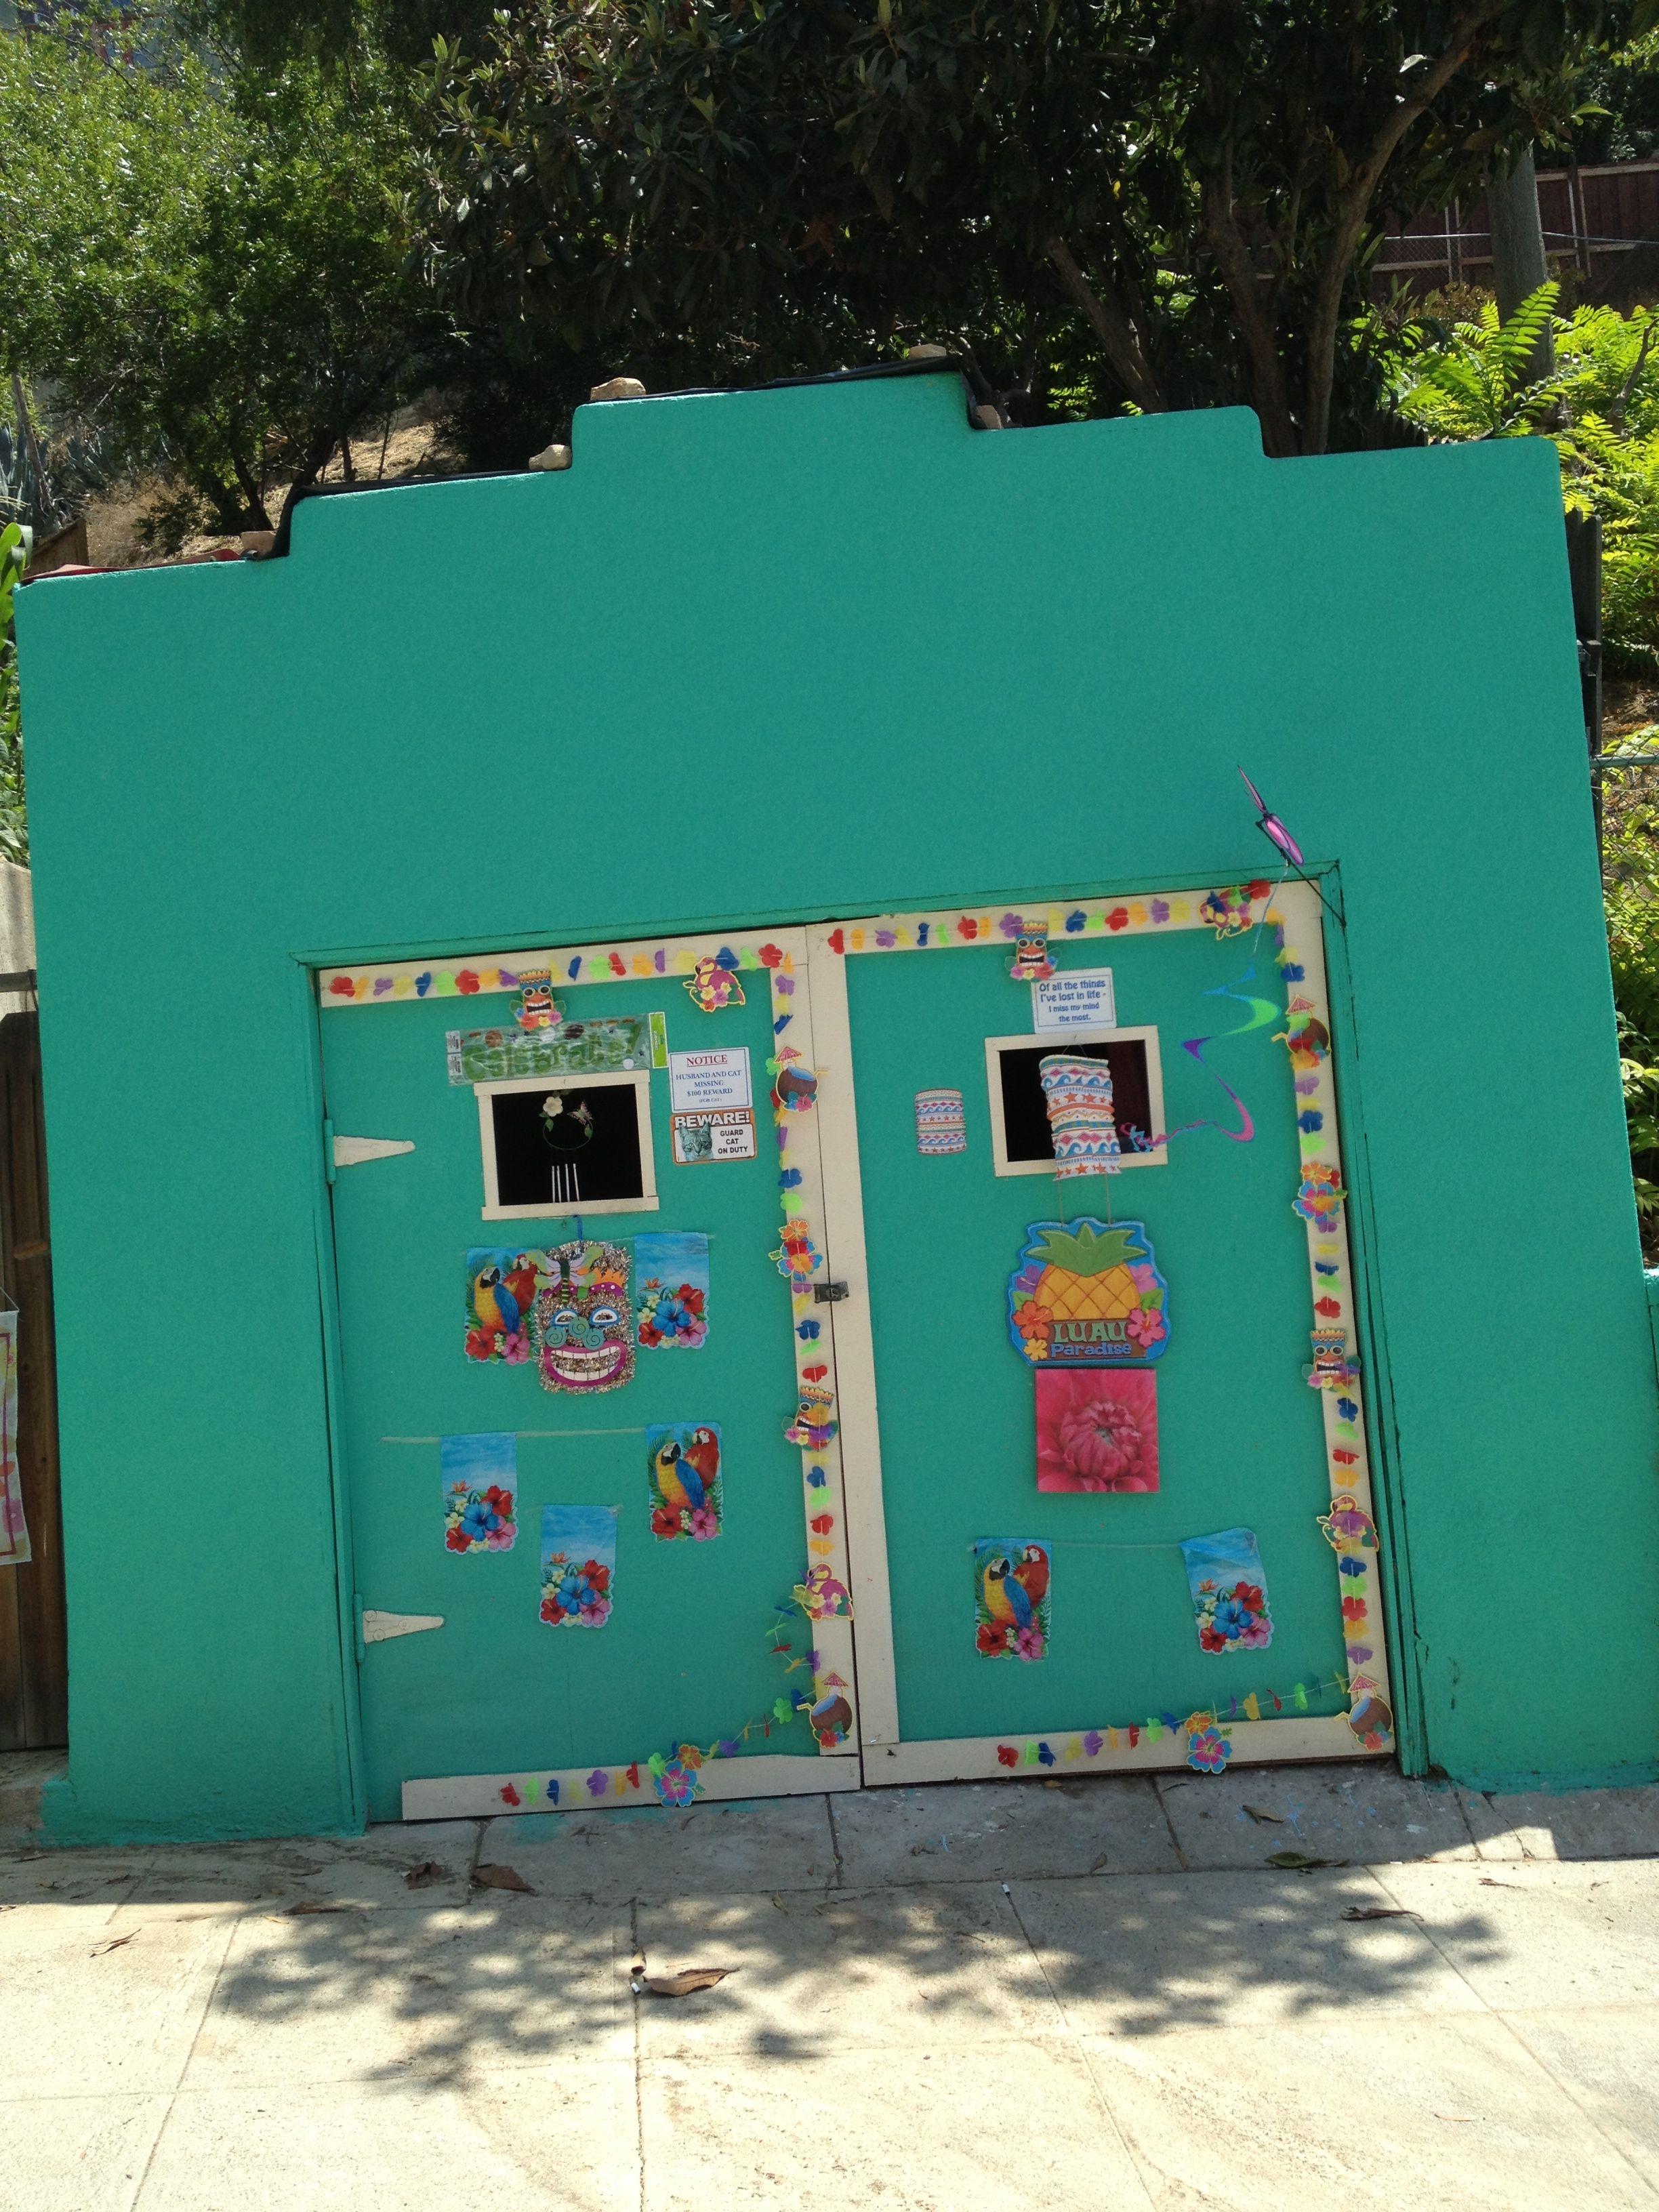 A Very Festive Garage Door On Museum Dr Mt Washington Los Angeles Northeast Los Angeles East Los Angeles Los Angeles Neighborhoods